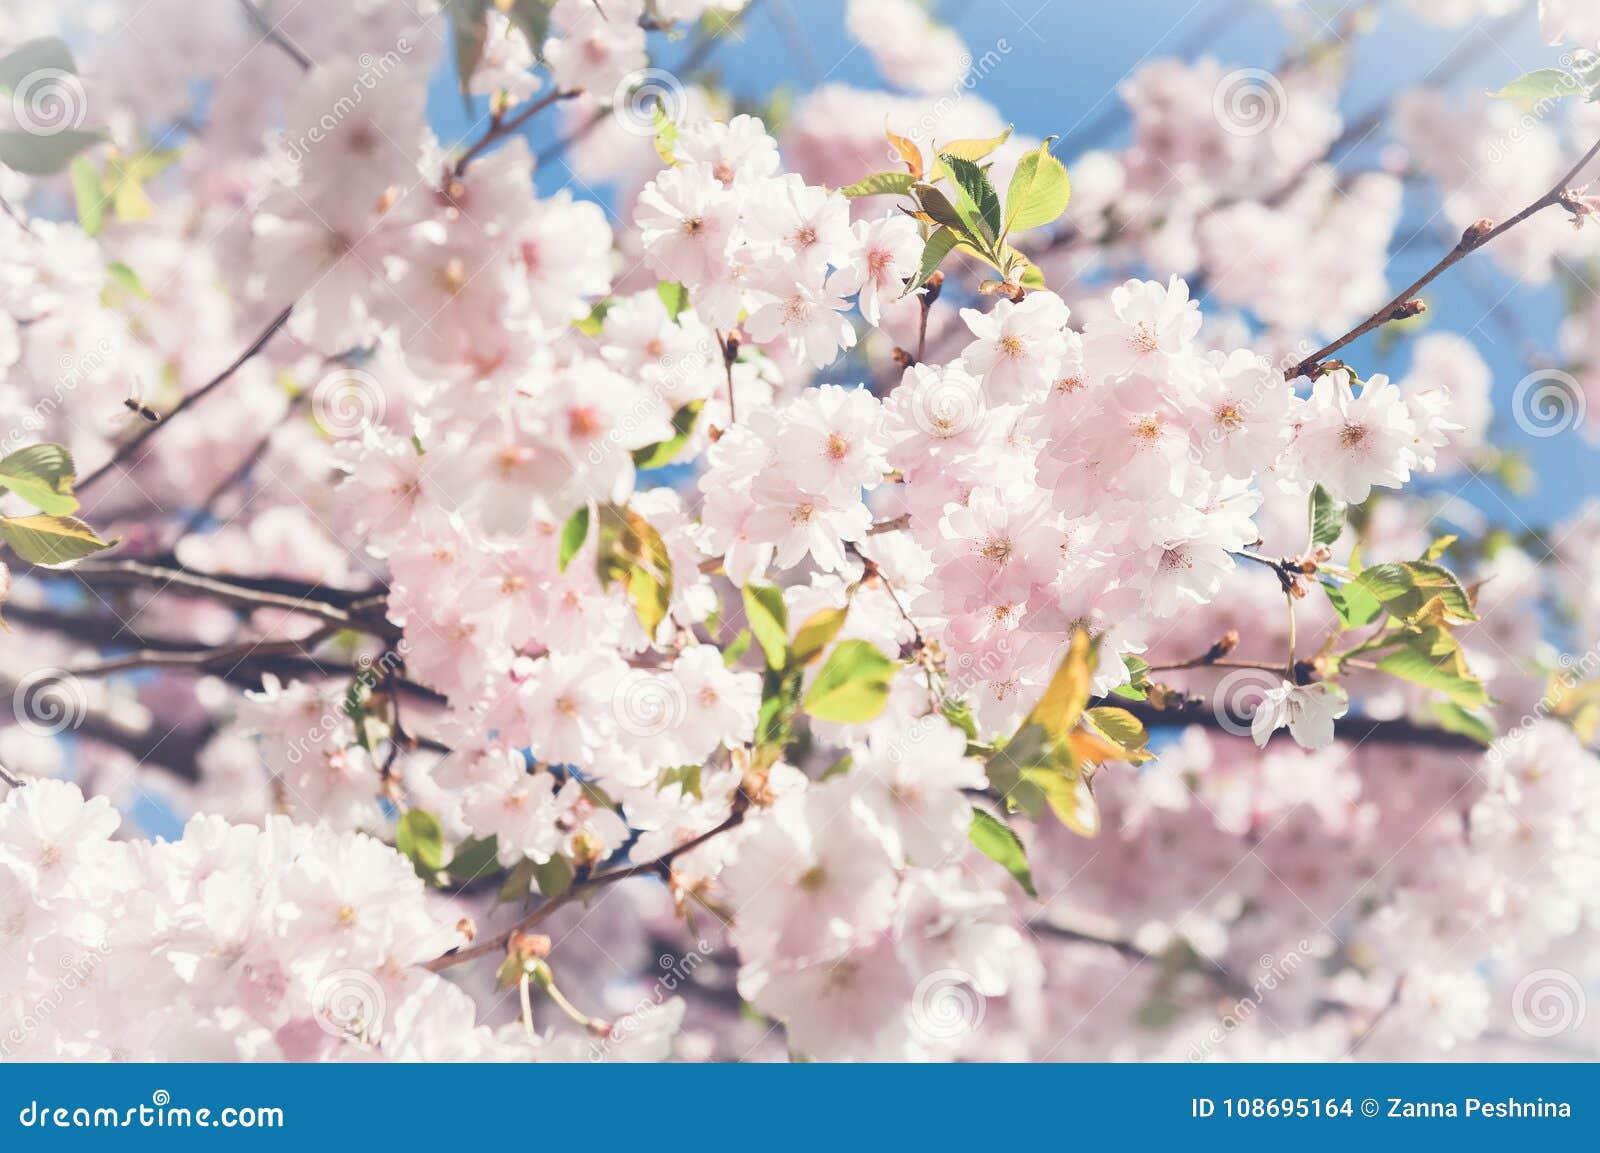 Sakura Fleurs De Cerisier Japon Fond Rose De Fleur De Ressort Photo